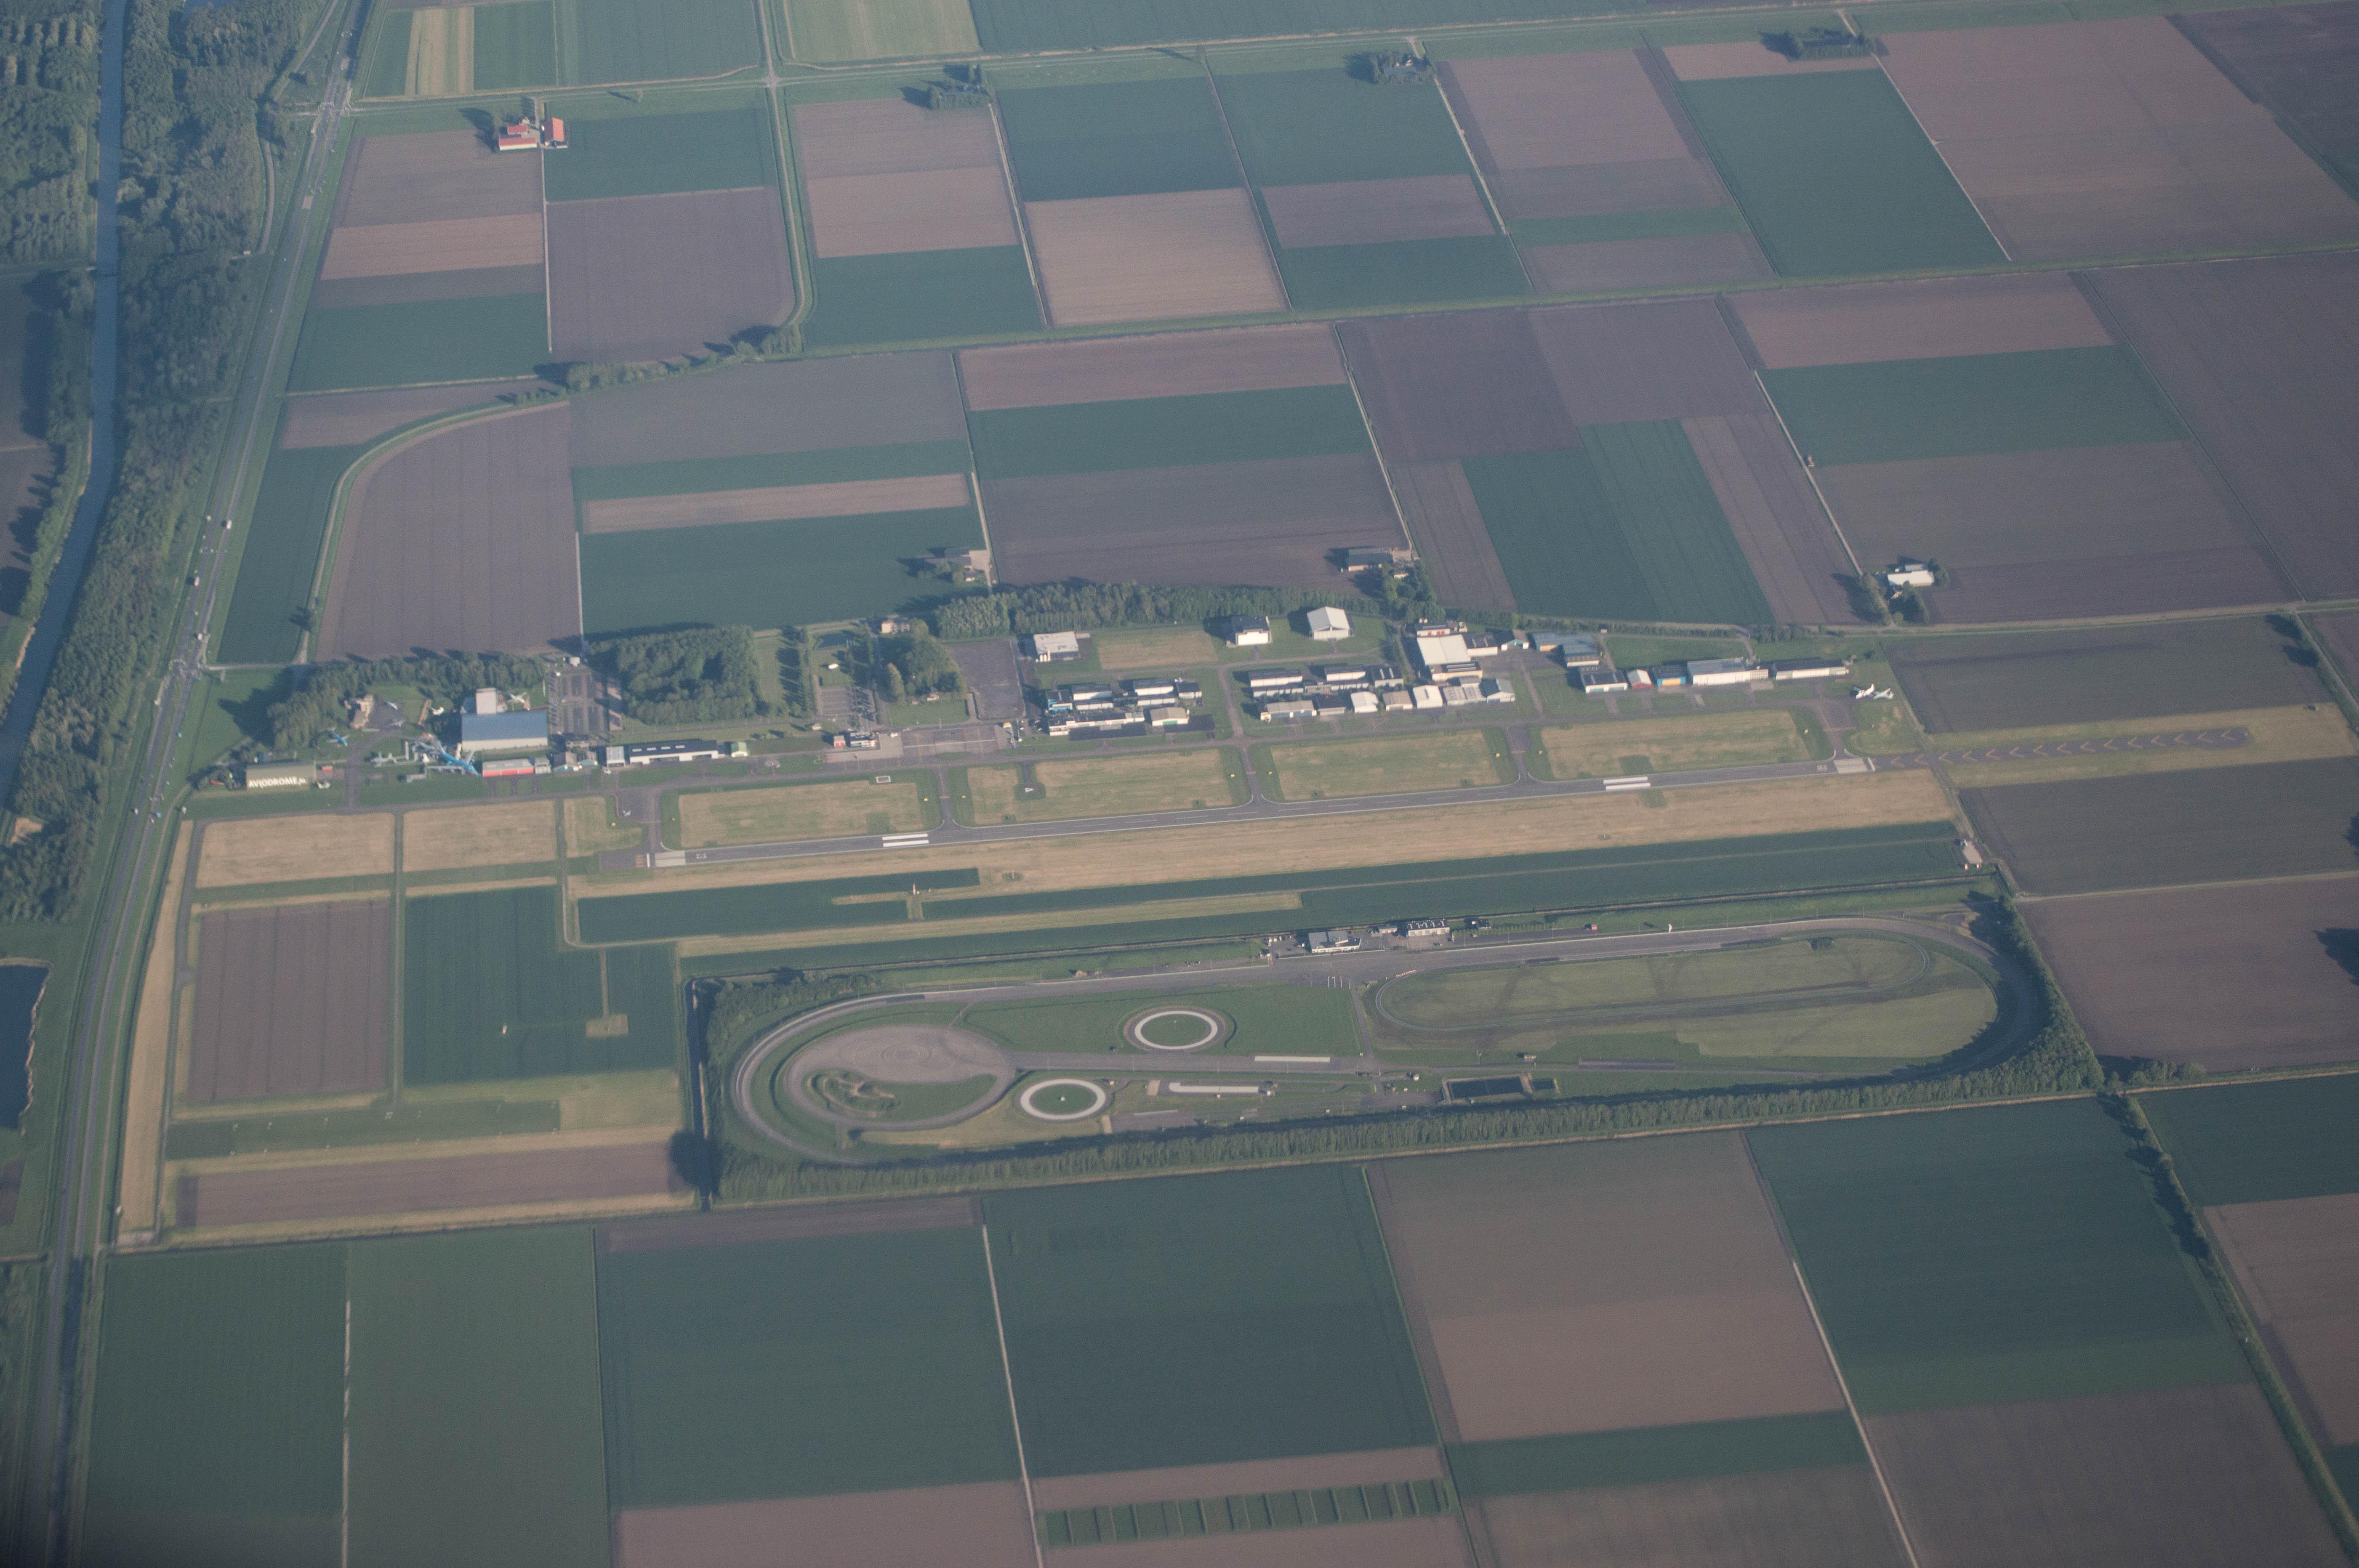 https://upload.wikimedia.org/wikipedia/commons/c/cb/Lelystad_Airport_%28aerial%29.jpg